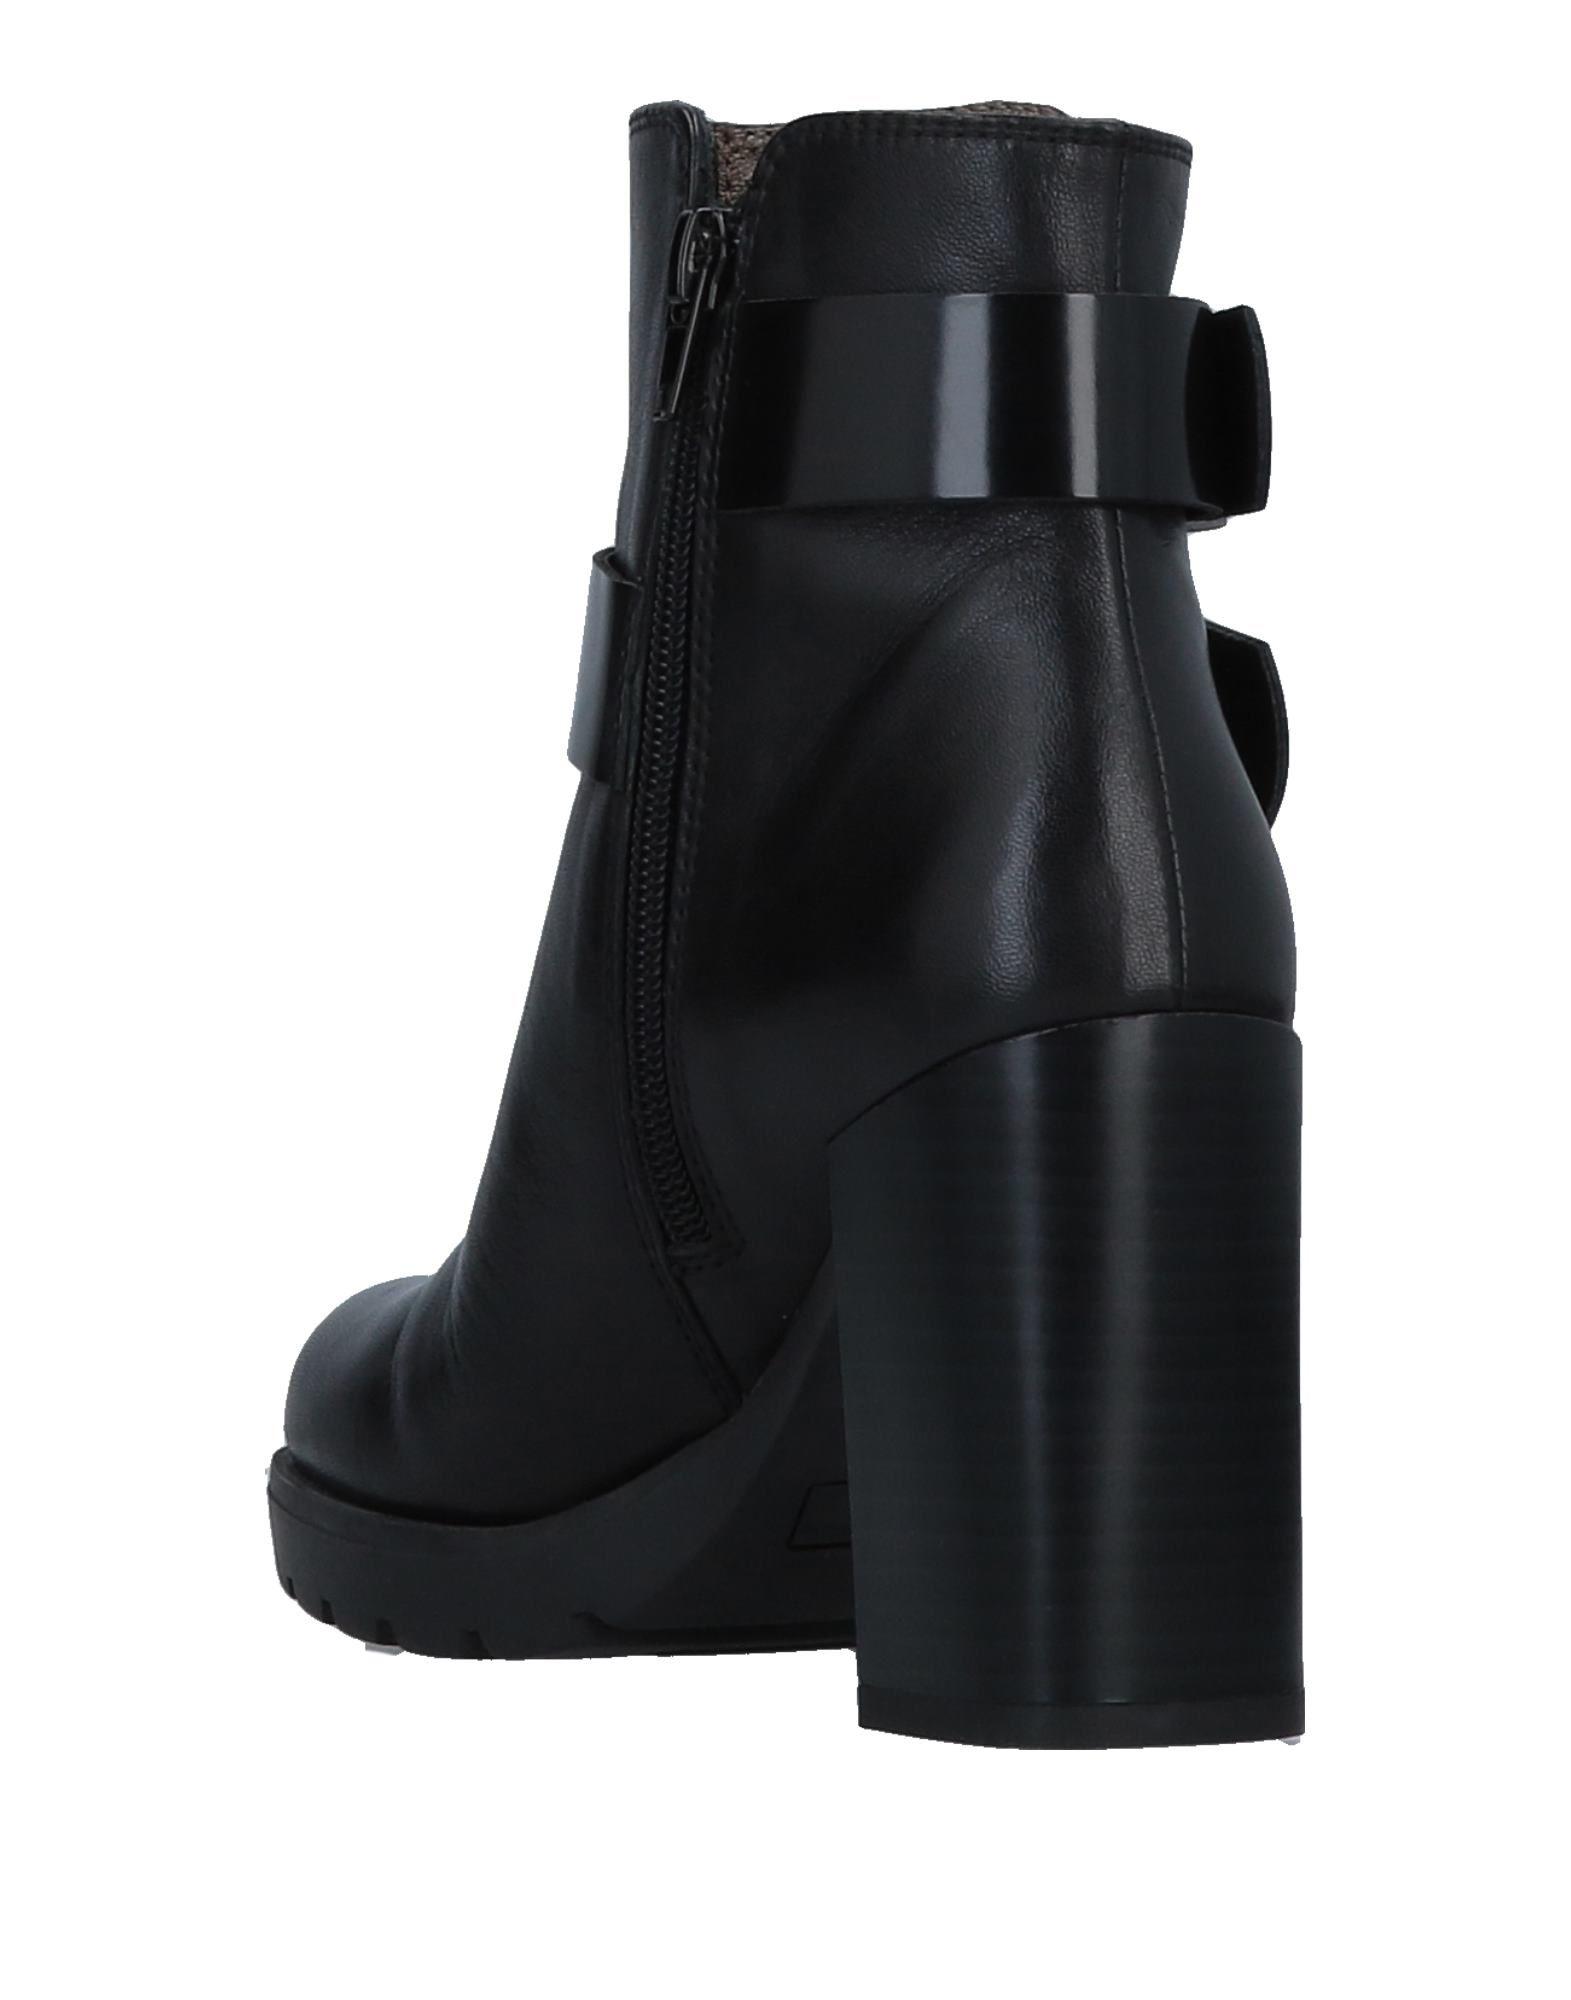 Tosca Blu Shoes Gute Stiefelette Damen  11512135RE Gute Shoes Qualität beliebte Schuhe d02699